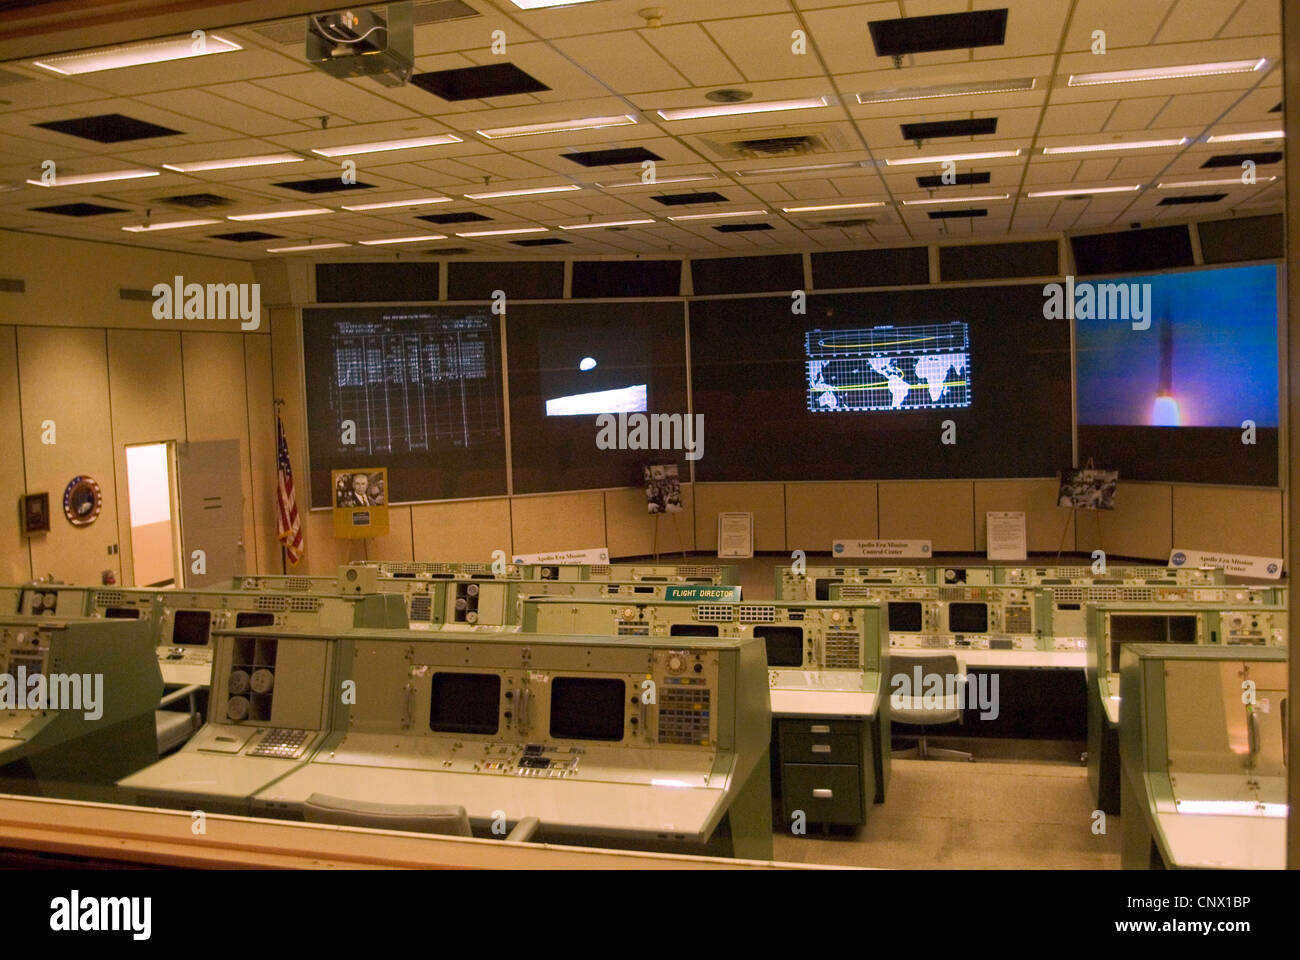 Apollo mission control room at NASA's Johnson Space Center. - Stock Image